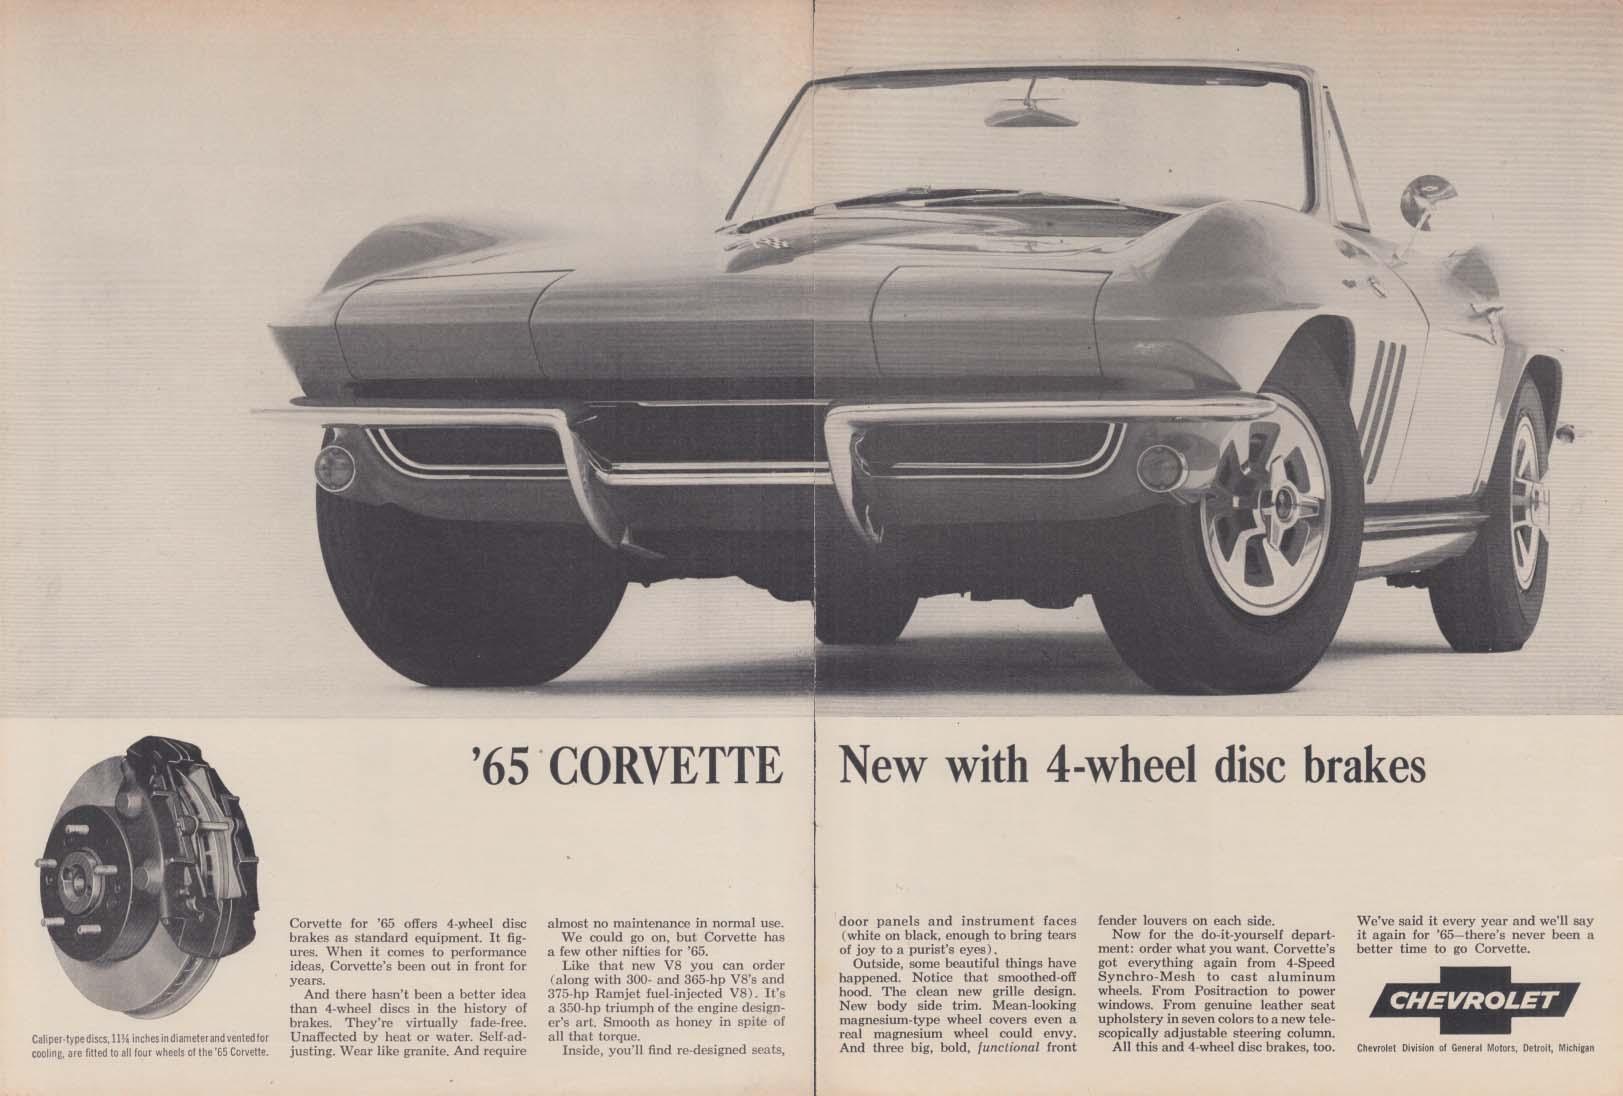 New with 4-wheel disc brakes Corvette ad 1965 RT